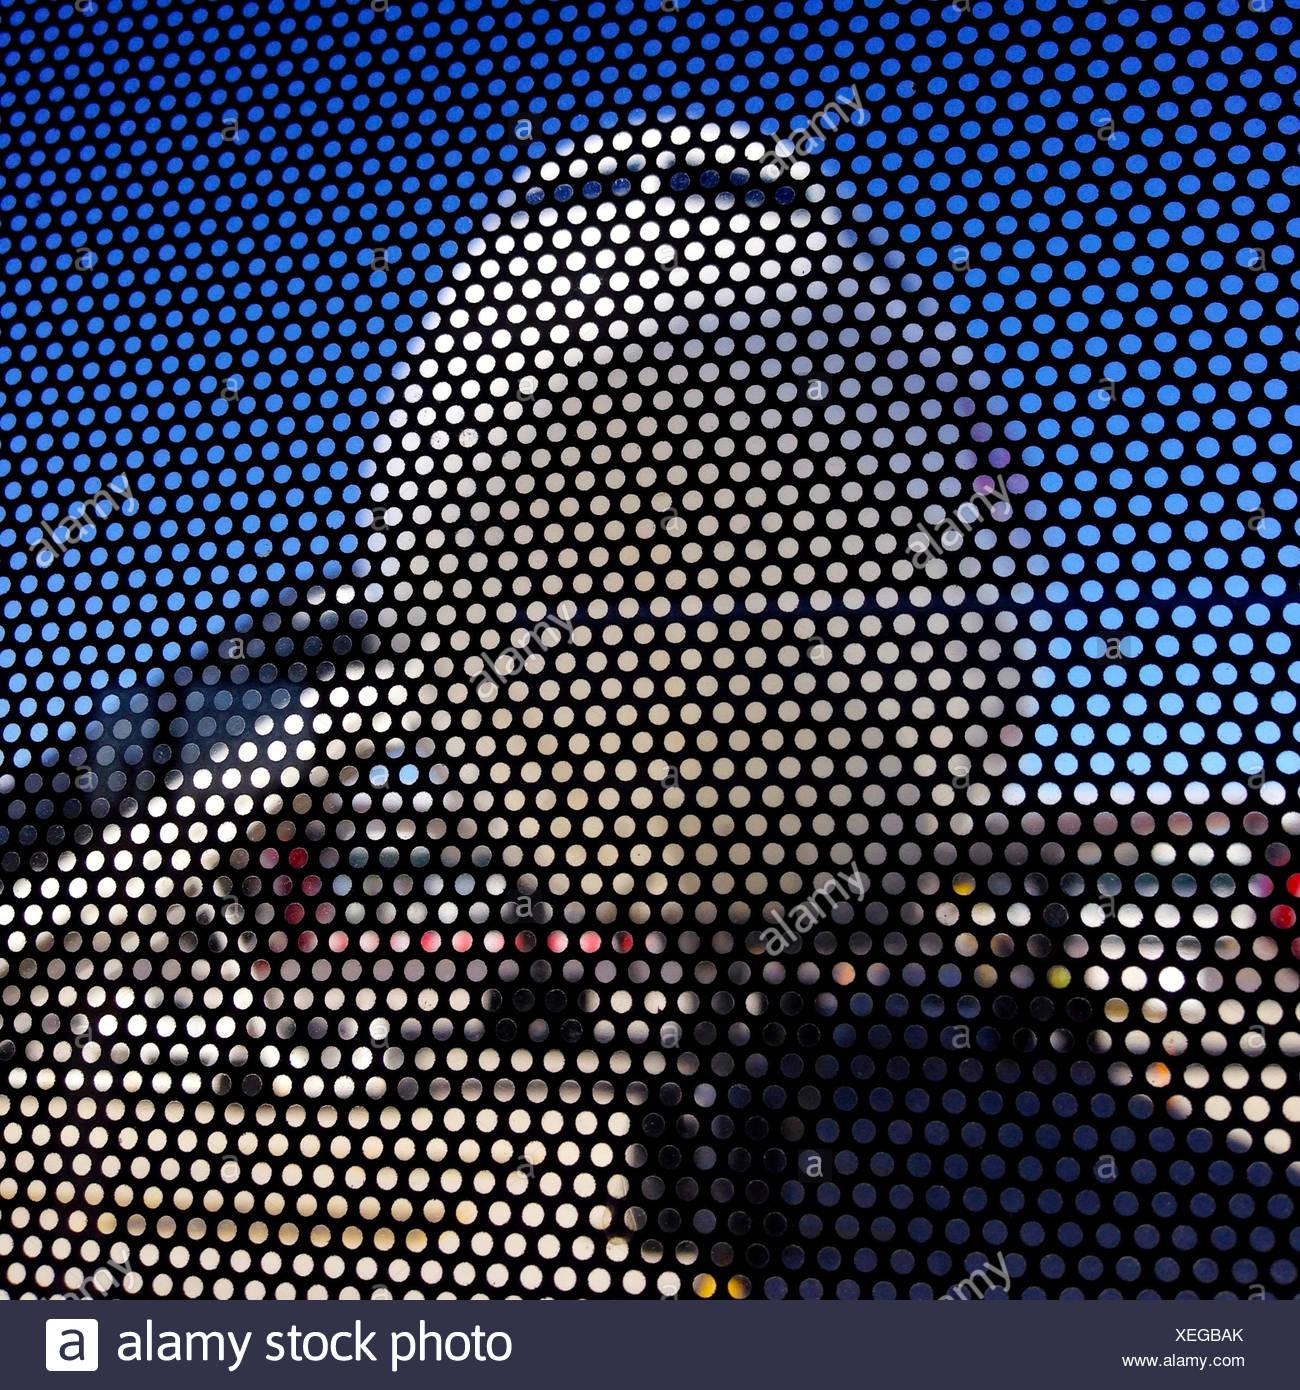 Plane viewed through metal mesh wall Stock Photo